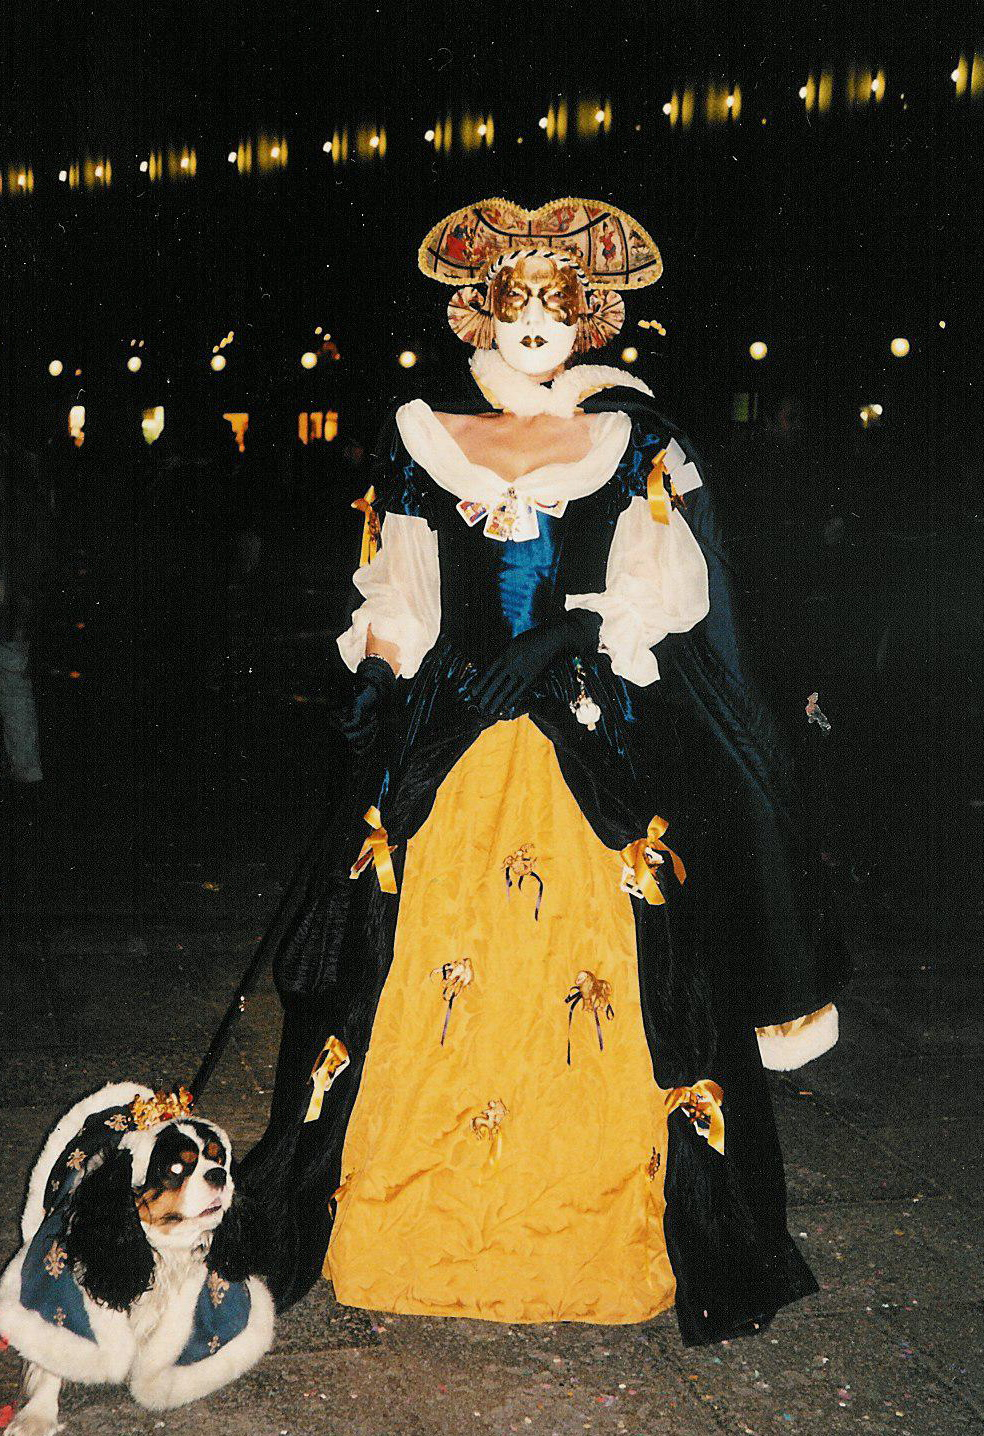 Robe Epoque 17e siècle marine et or